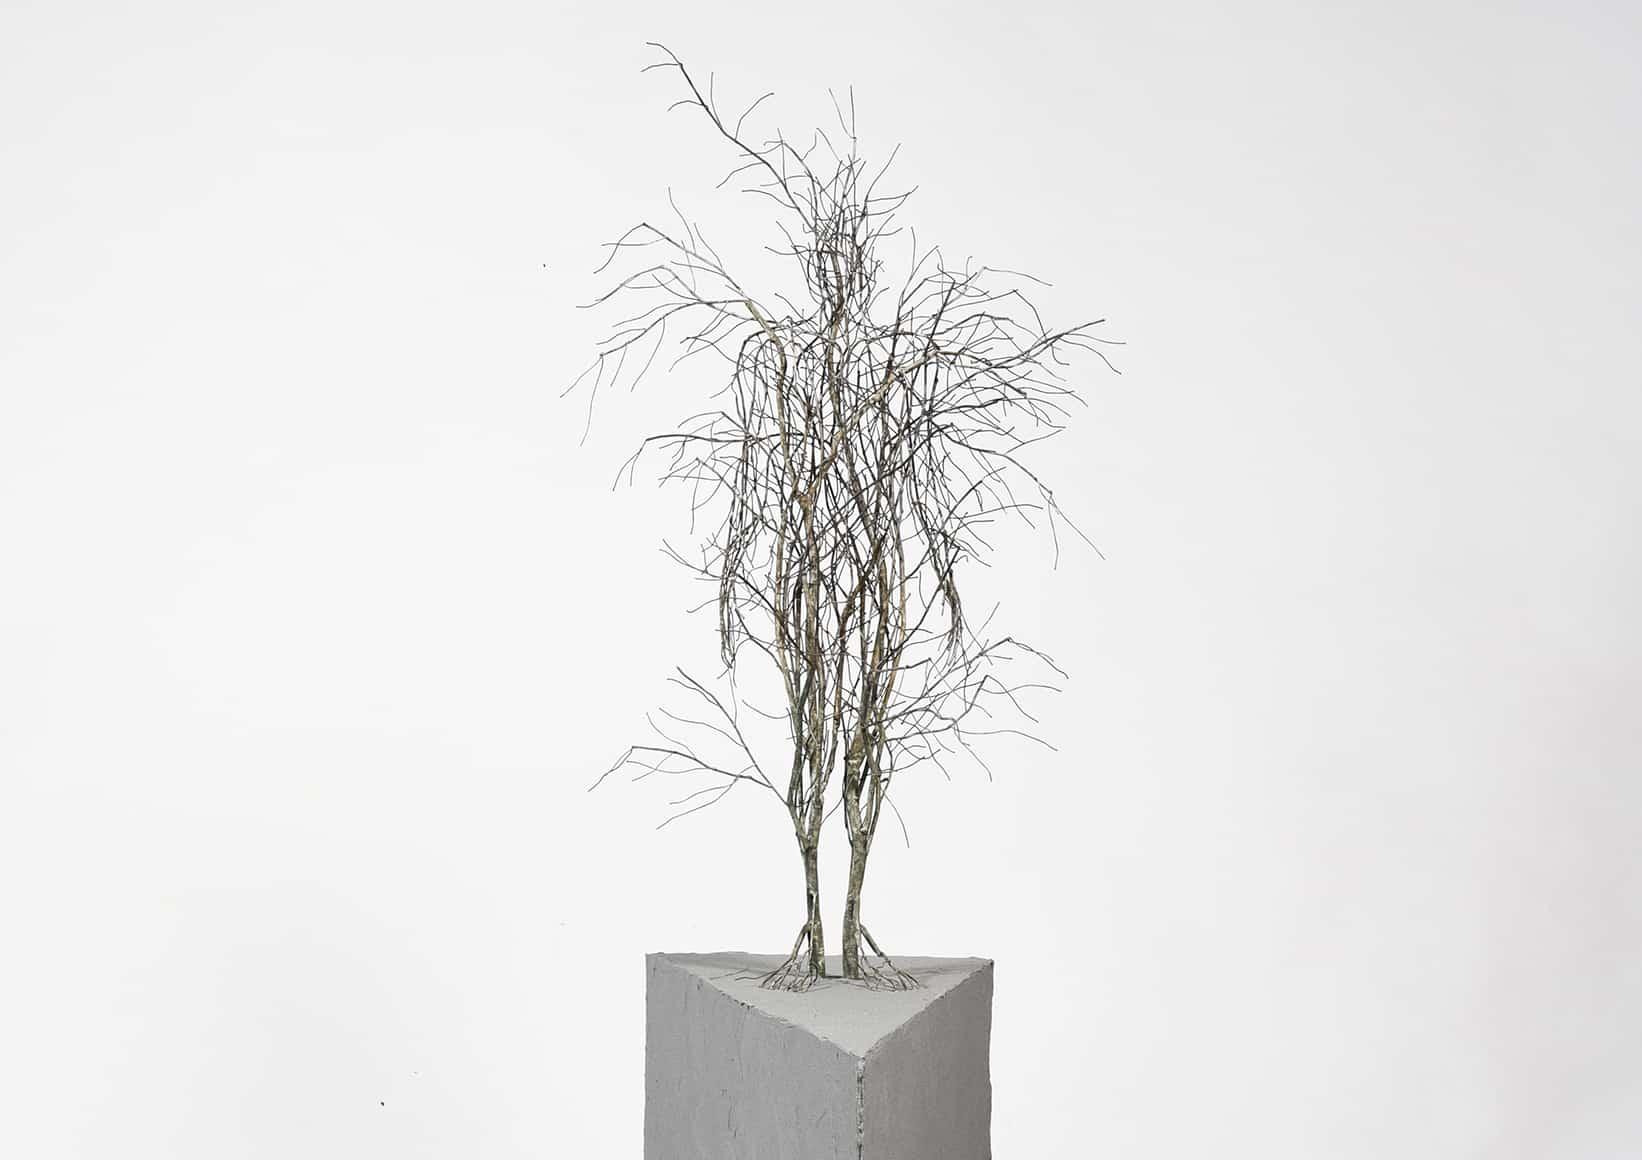 raices de acero inoxidable sun hyuk kim escultura